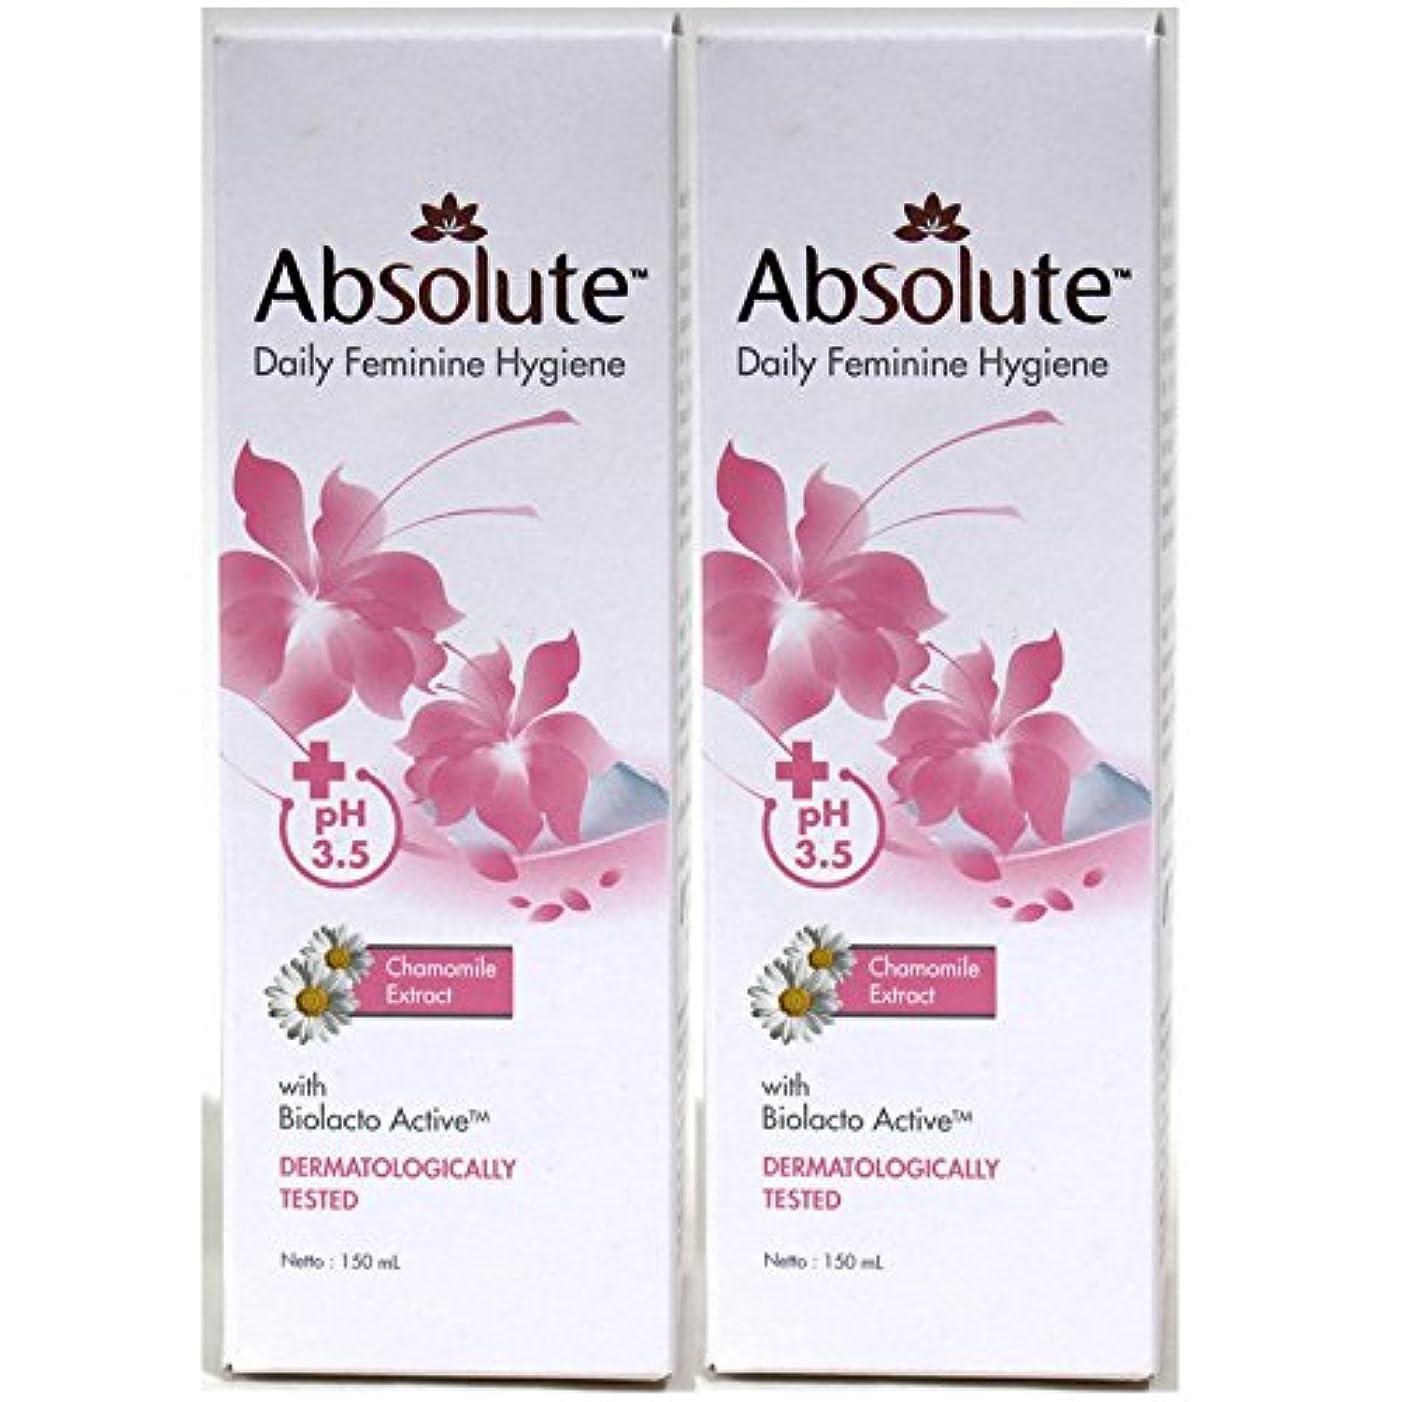 Absolute(アブソリュート)女性用液体ソープ 150ml 2本セット[並行輸入品][海外直送品]